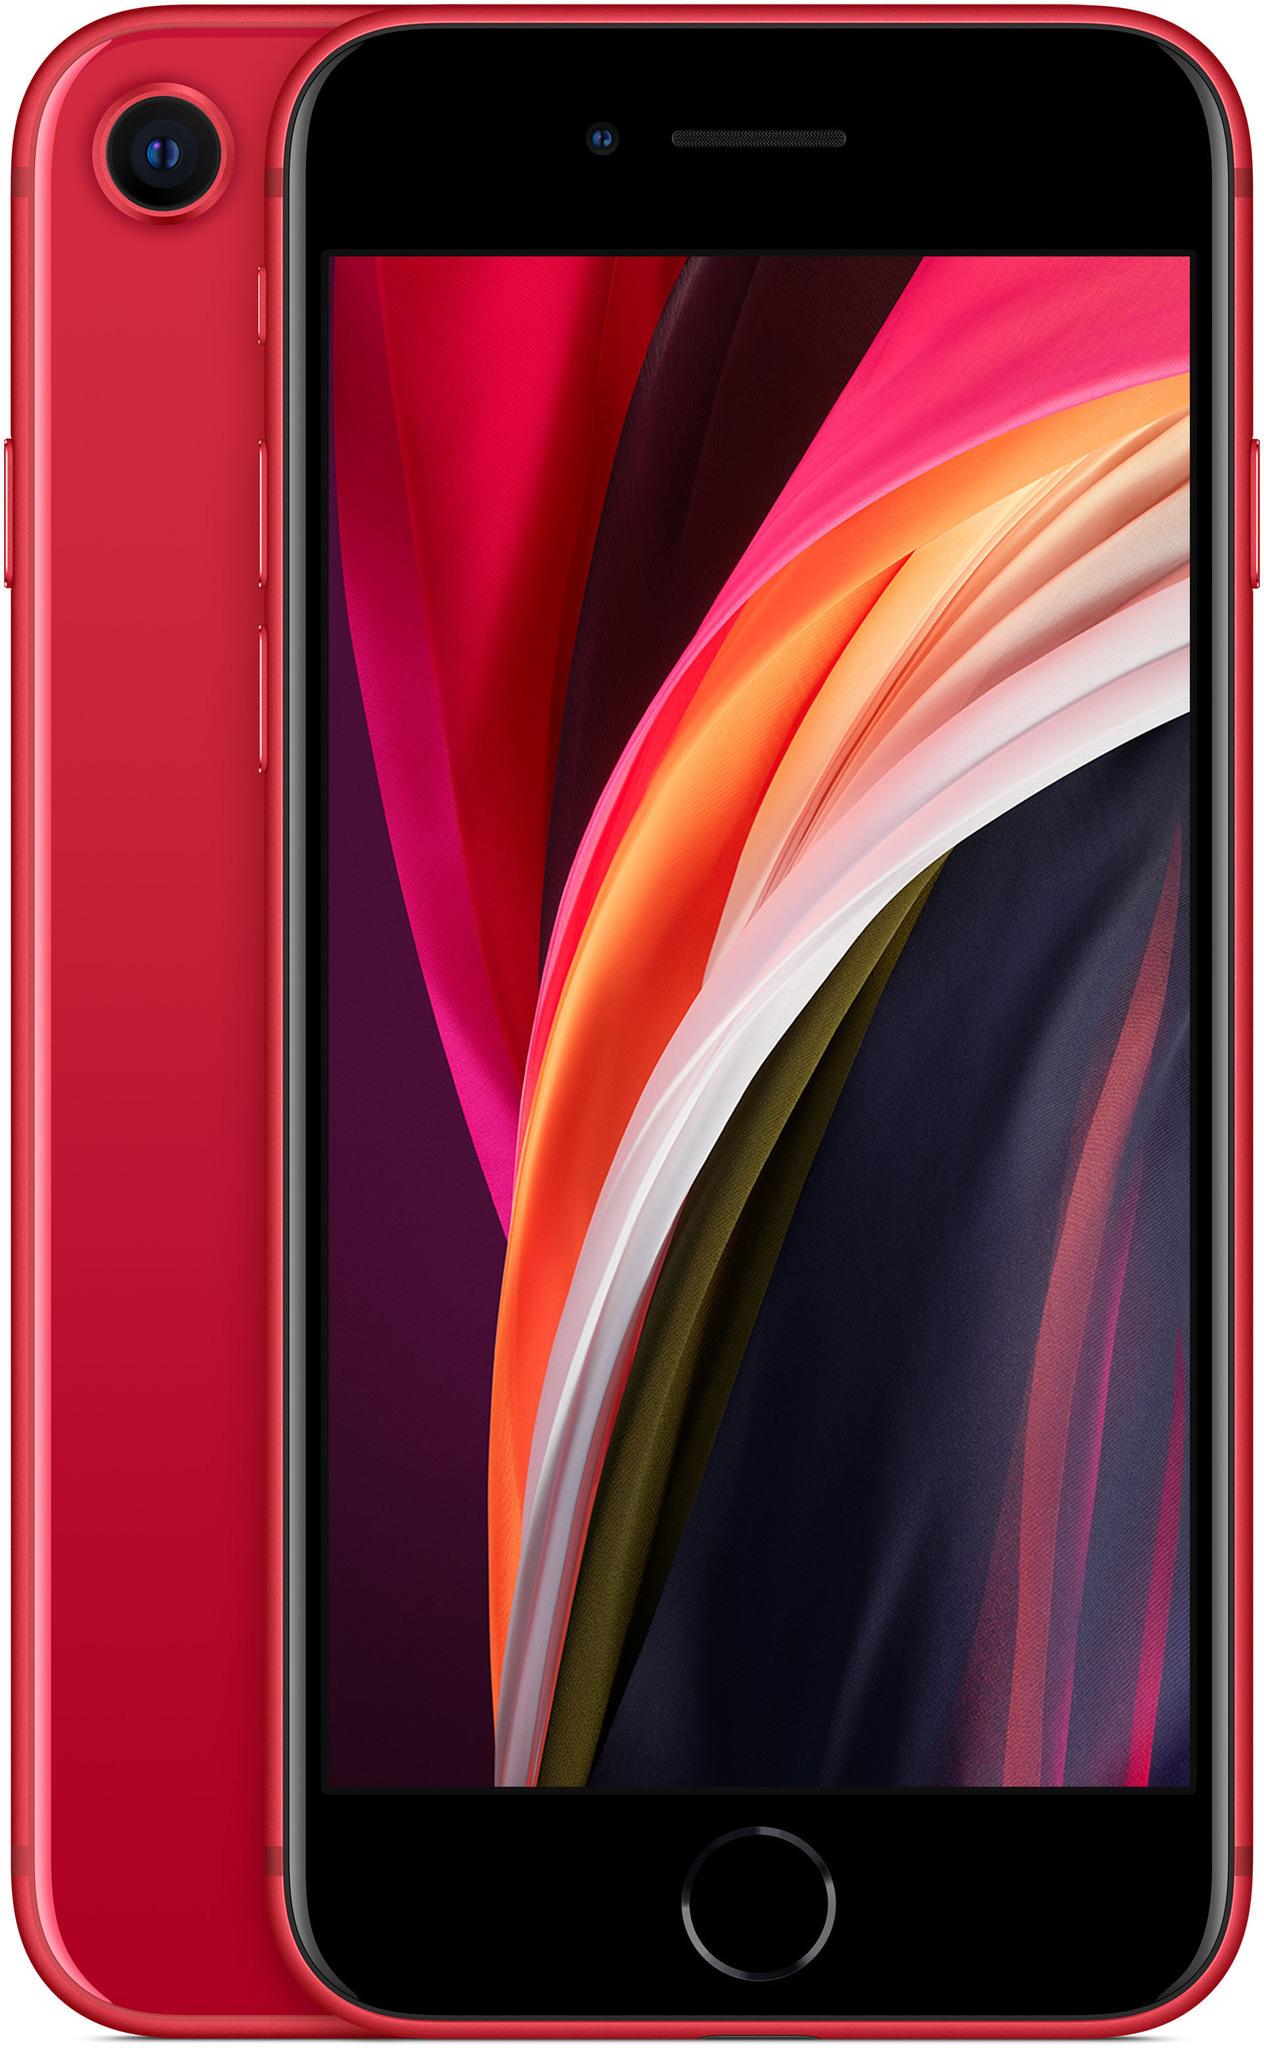 iPhone SE 2020 Apple iPhone SE 2020 64gb Красный red1.jpg